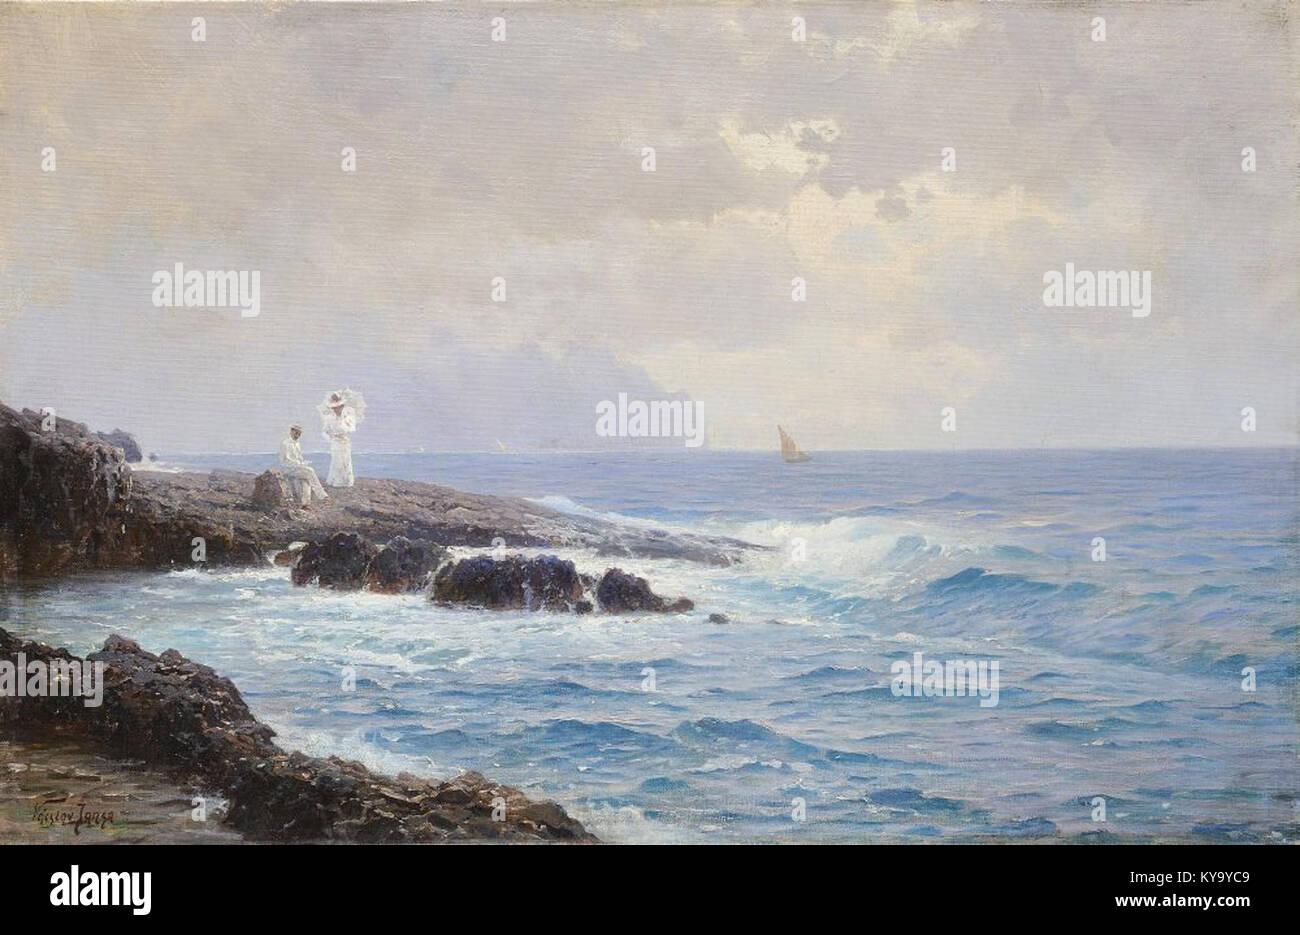 Václav Jansa (1859-1913) - Milenci u moře - Stock Image